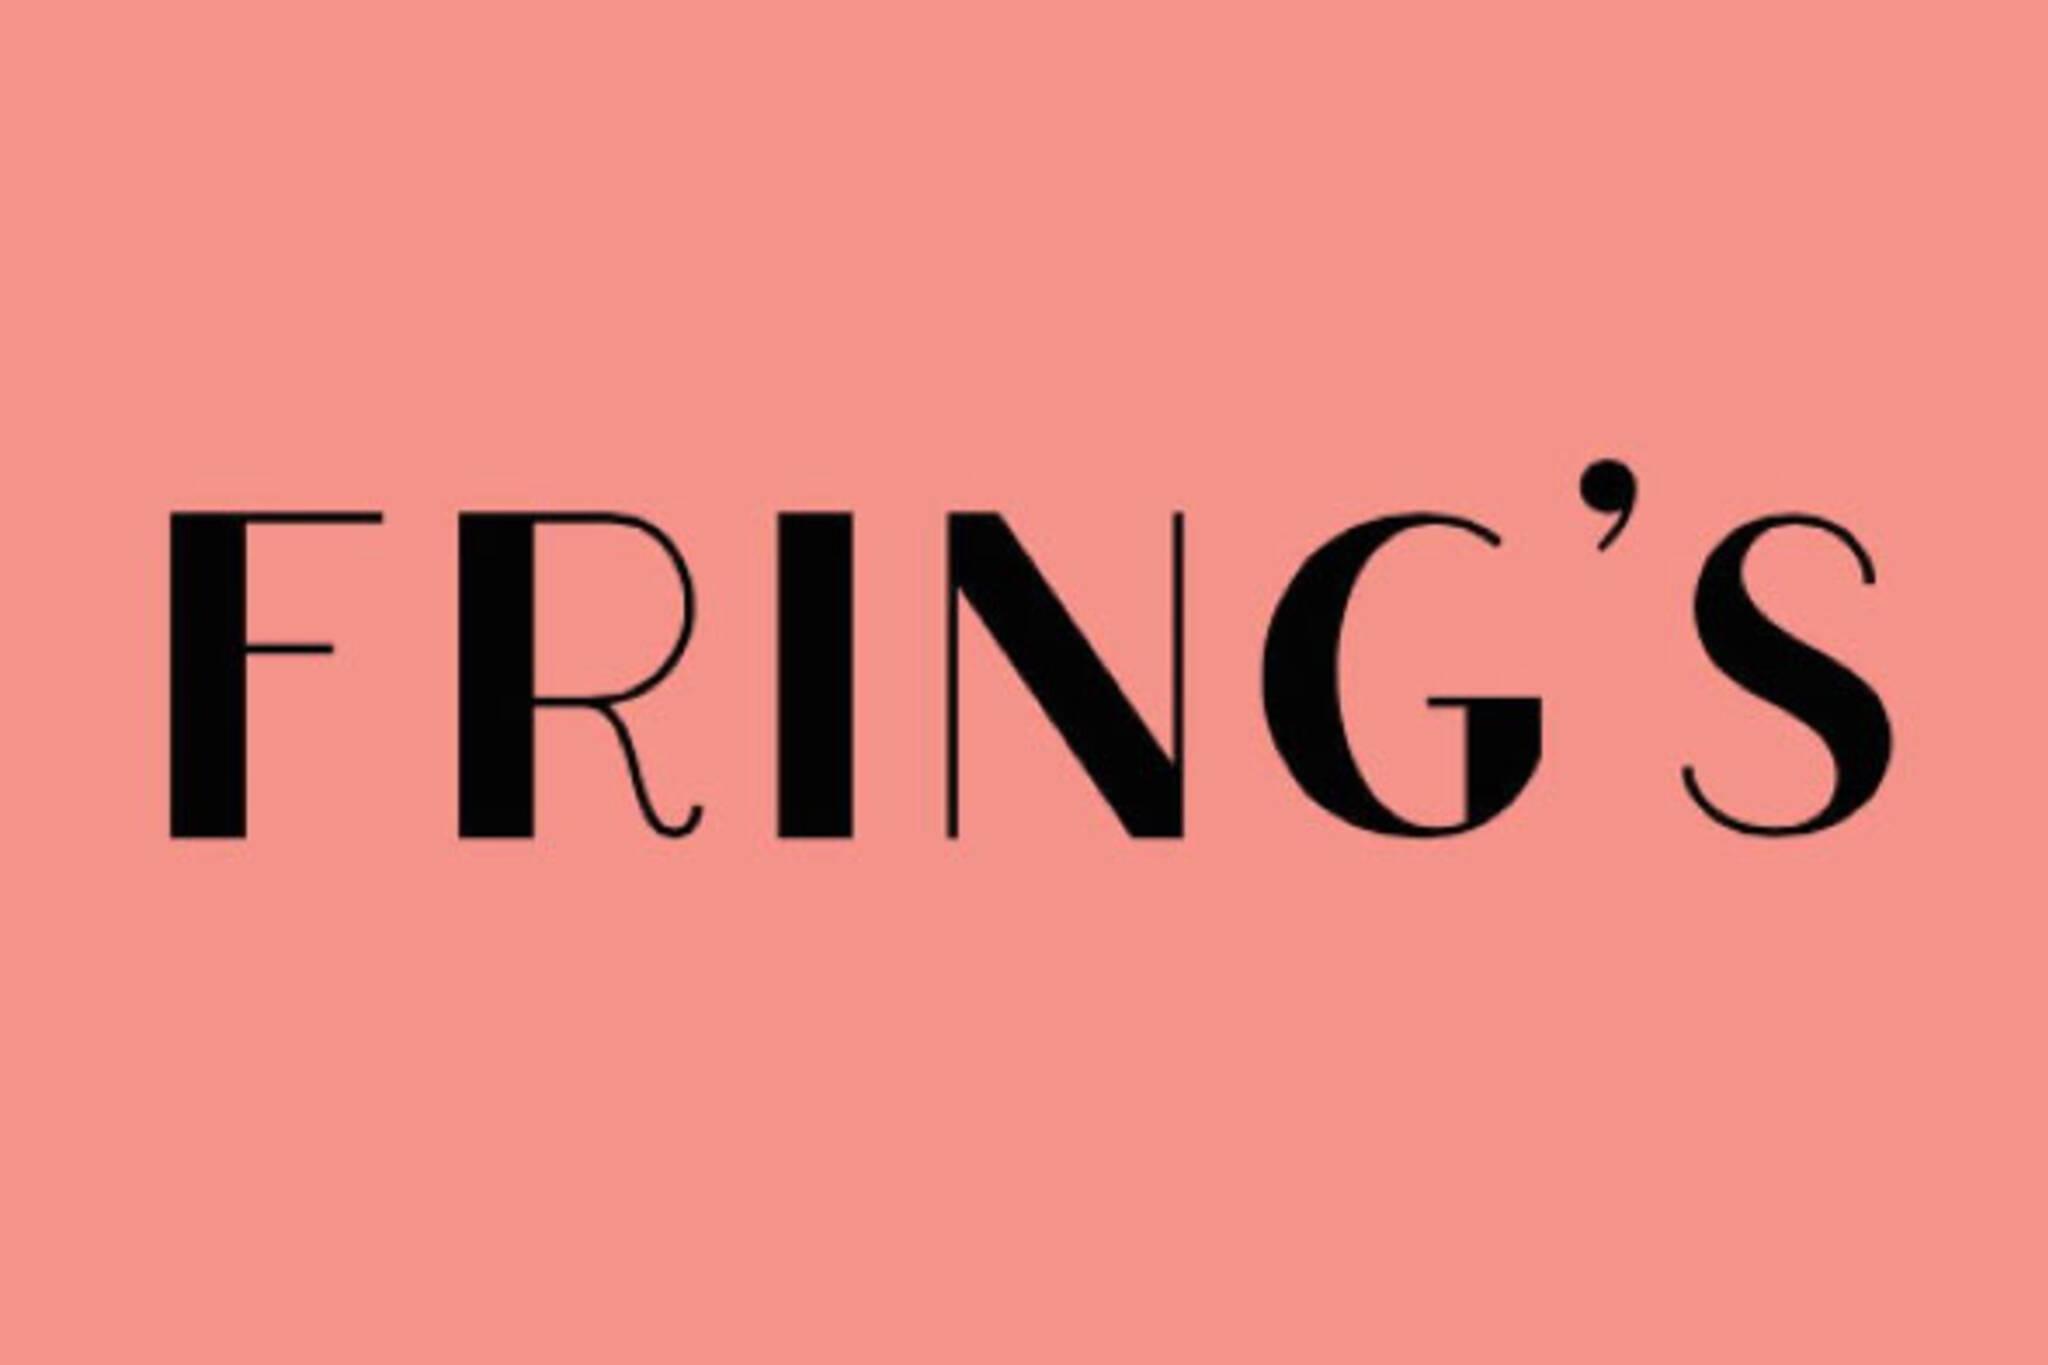 frings toronto